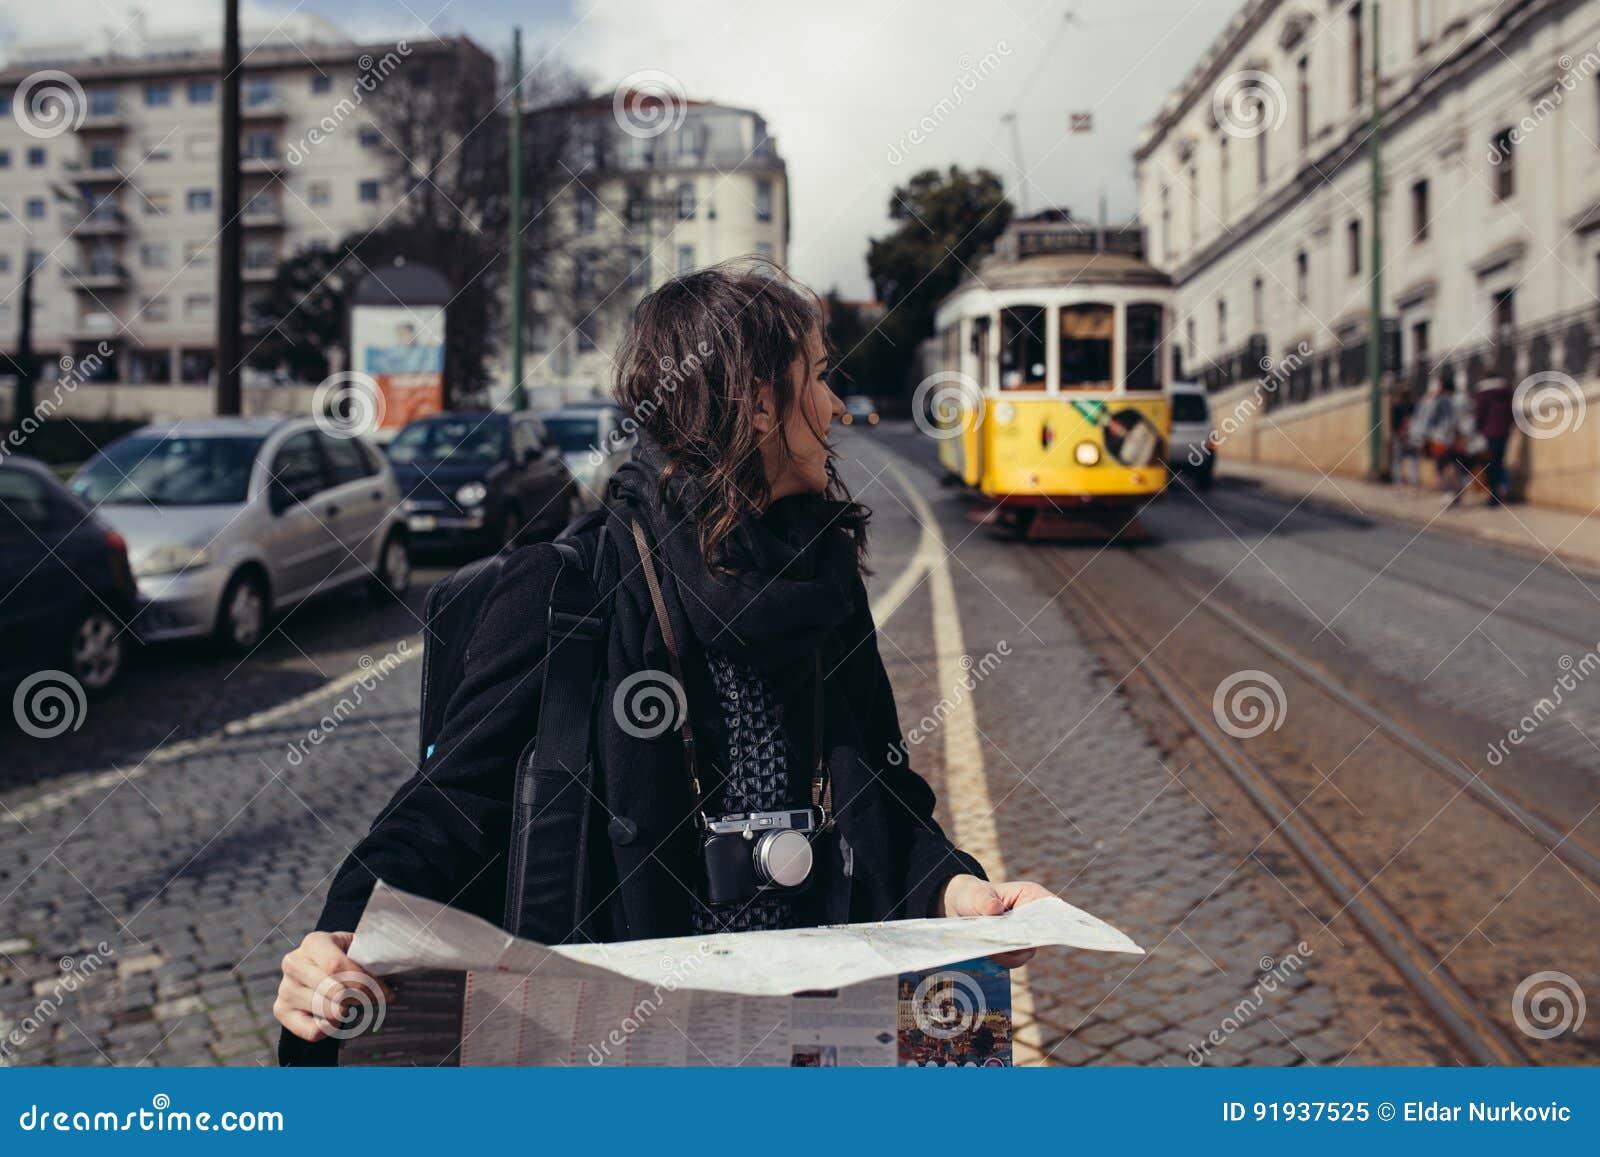 Female traveler holding and reading tourist map